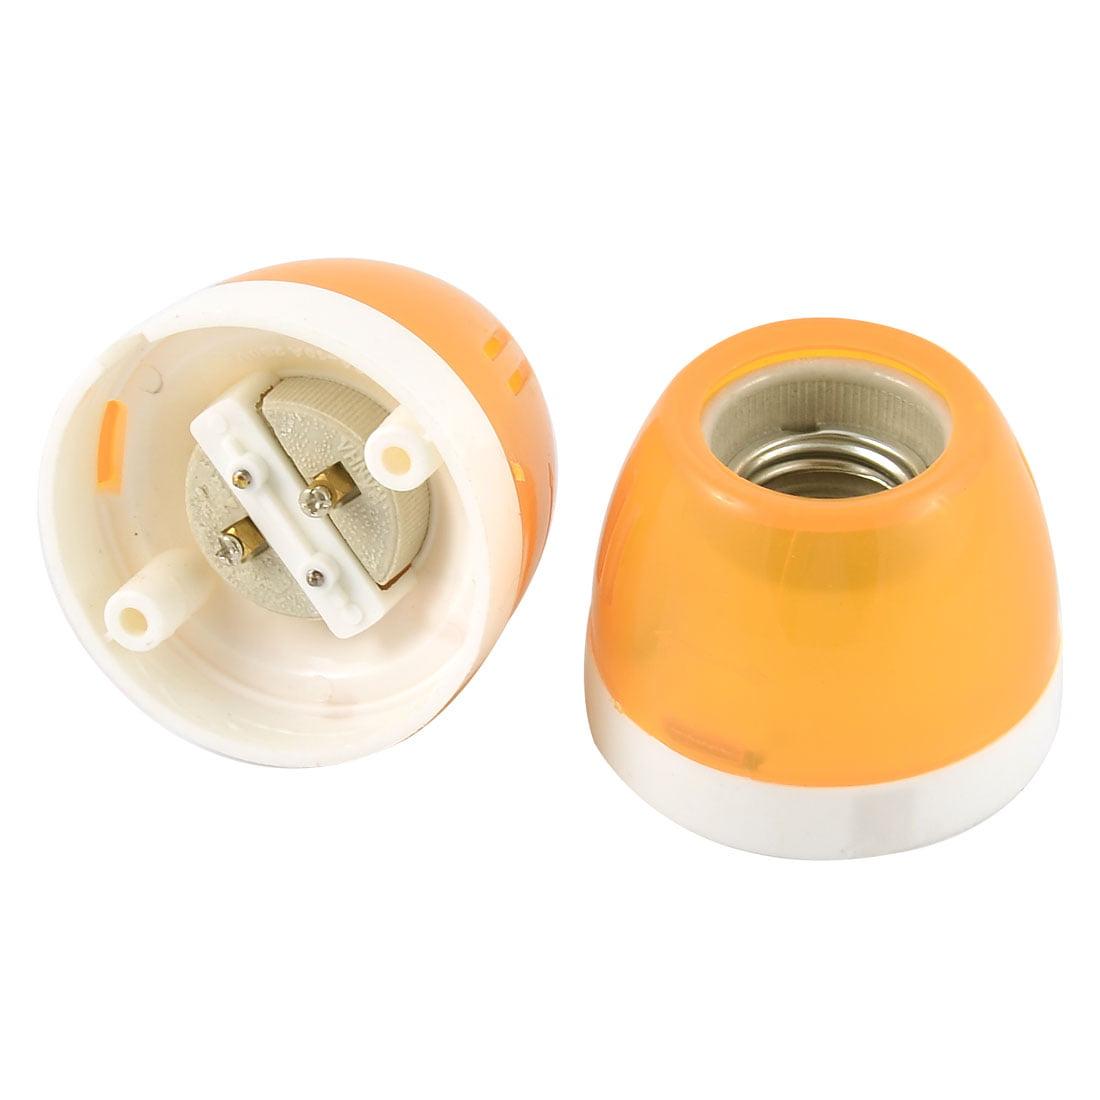 AC 250V 6A Wall Mounted E27 Light Bulb Lamp Socket Holder...